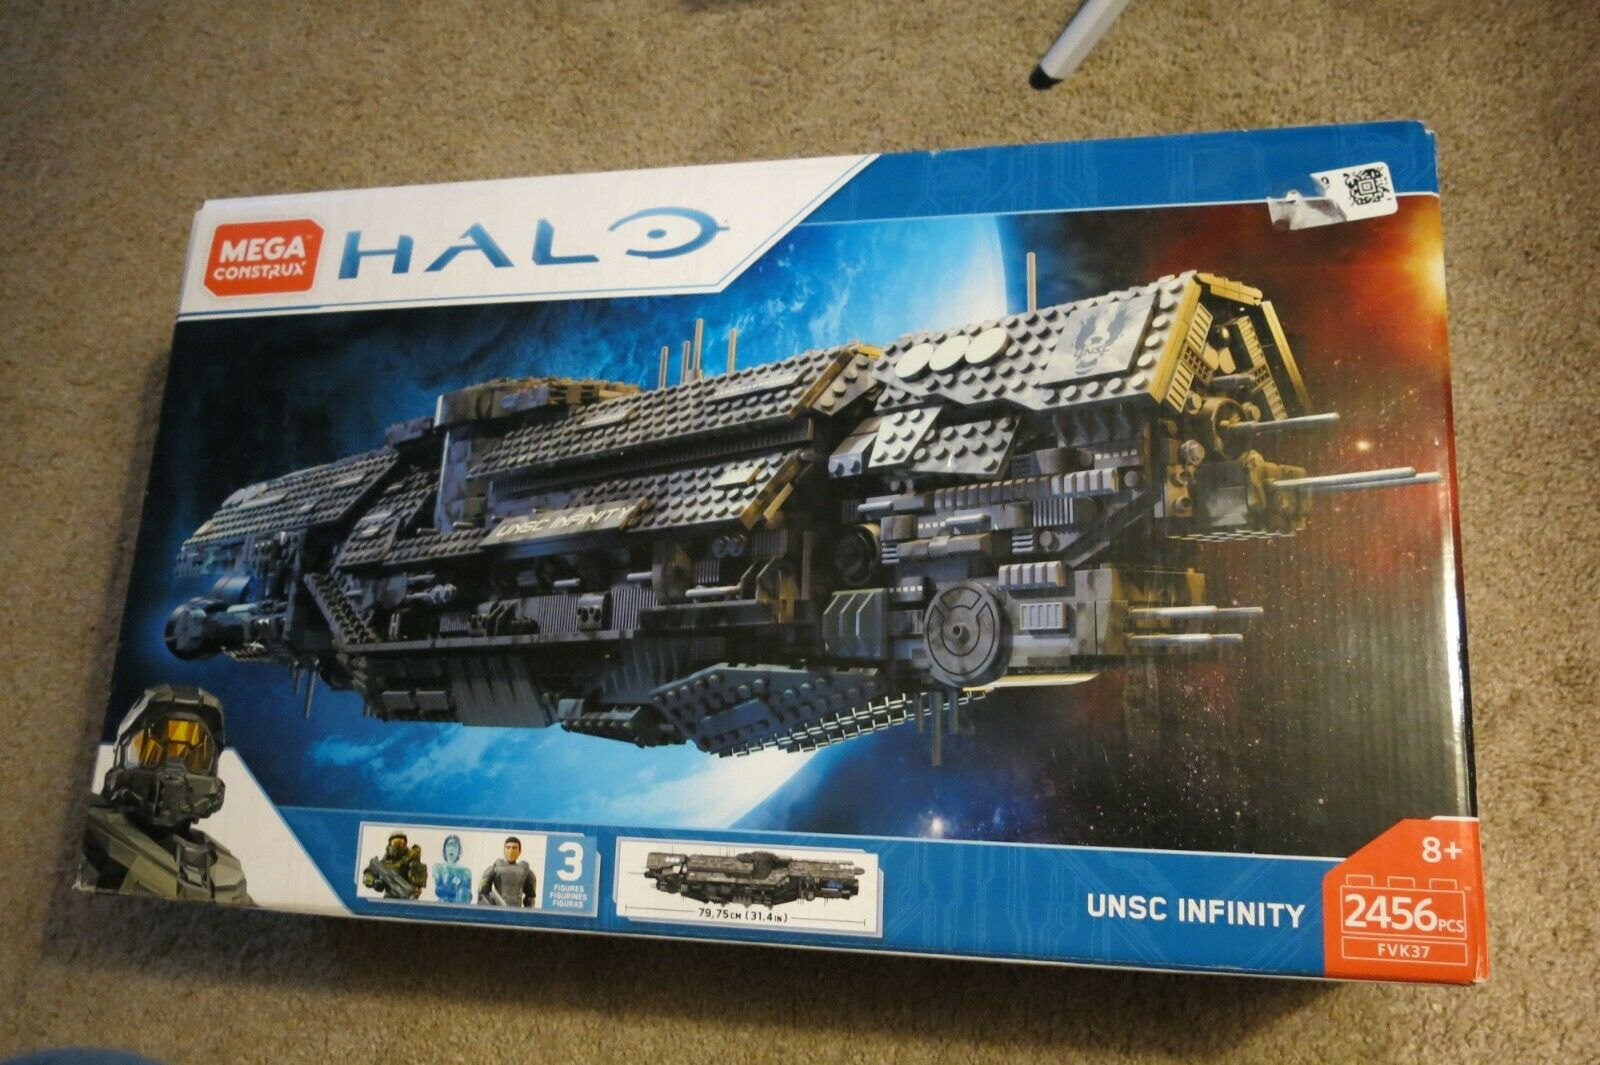 Mega Construx Halo UNSC Infinity FVK37 Building Set CHOP